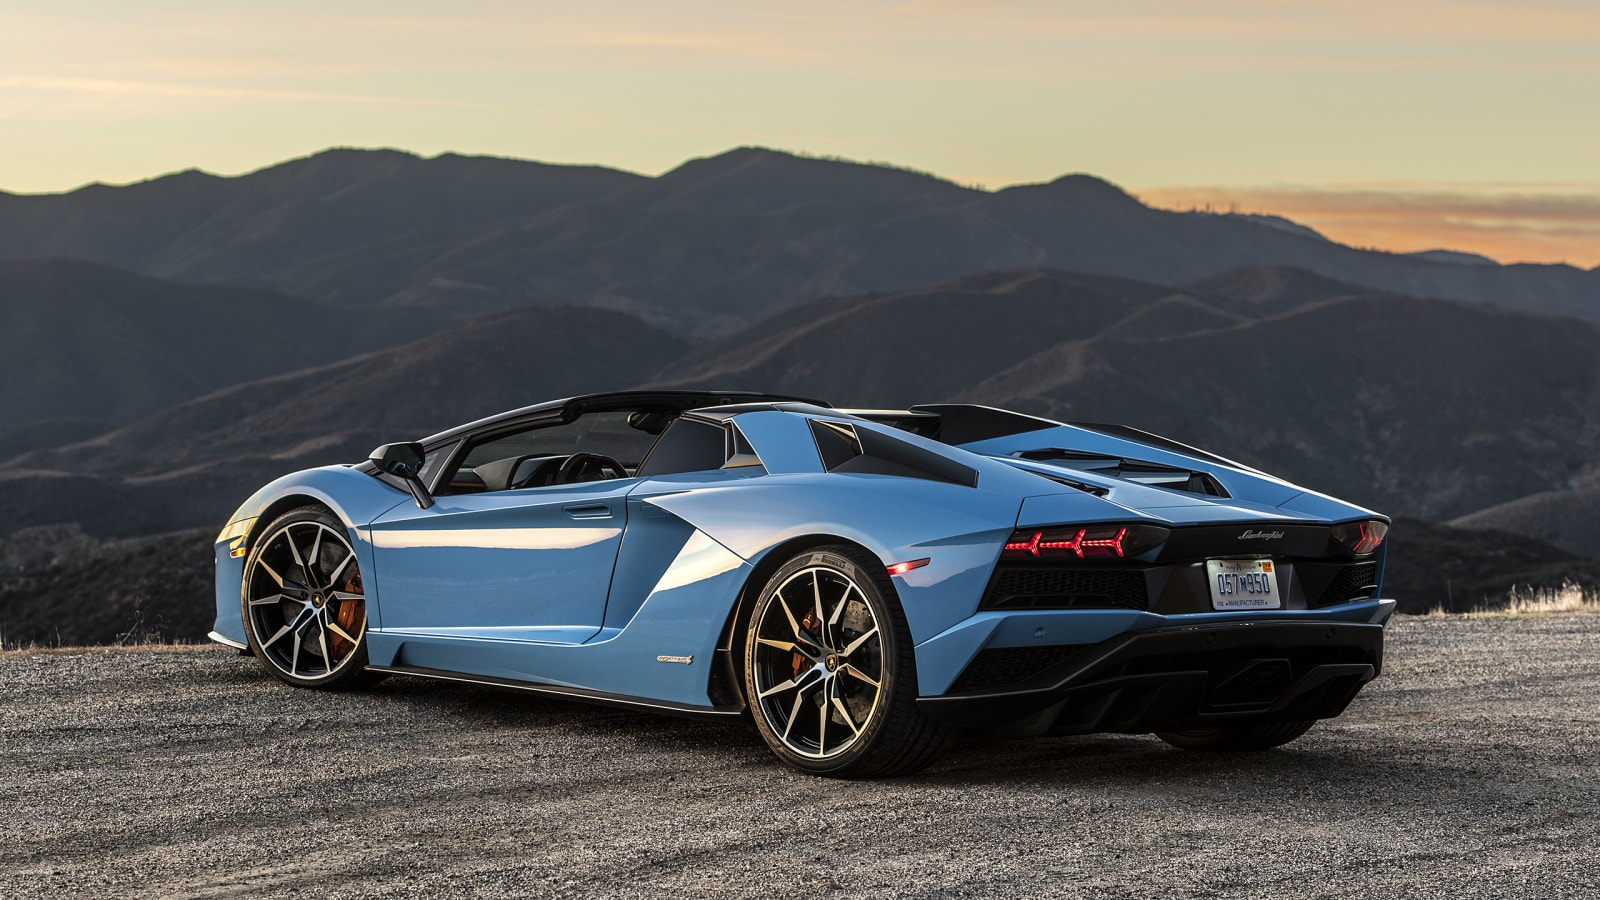 Release 2020 Lamborghini Aventador